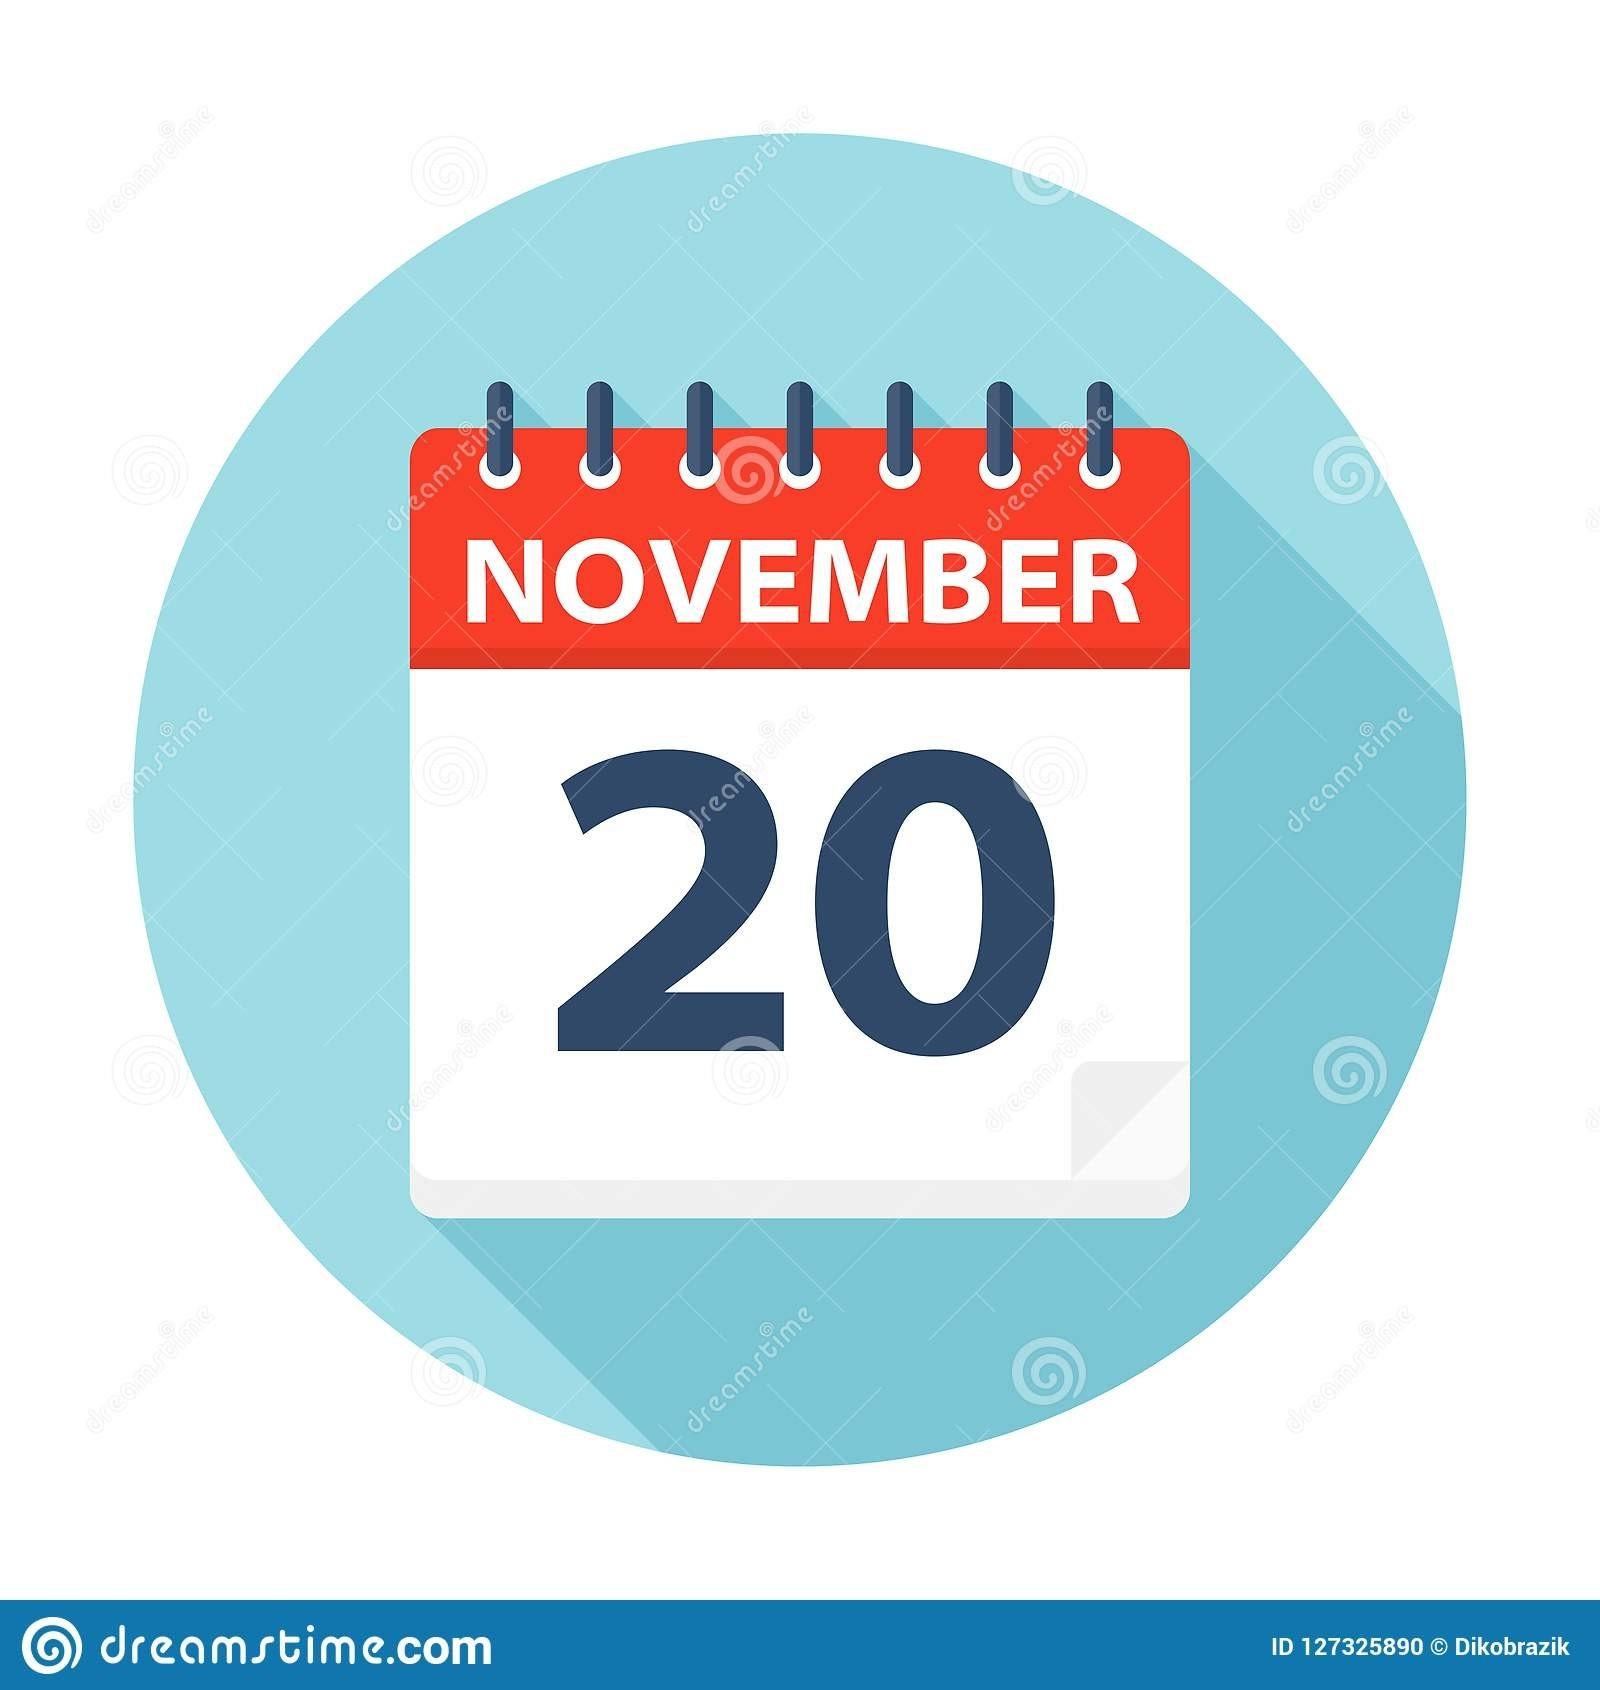 November 20 - Calendar Icon Stock Illustration  November Clipart 2020